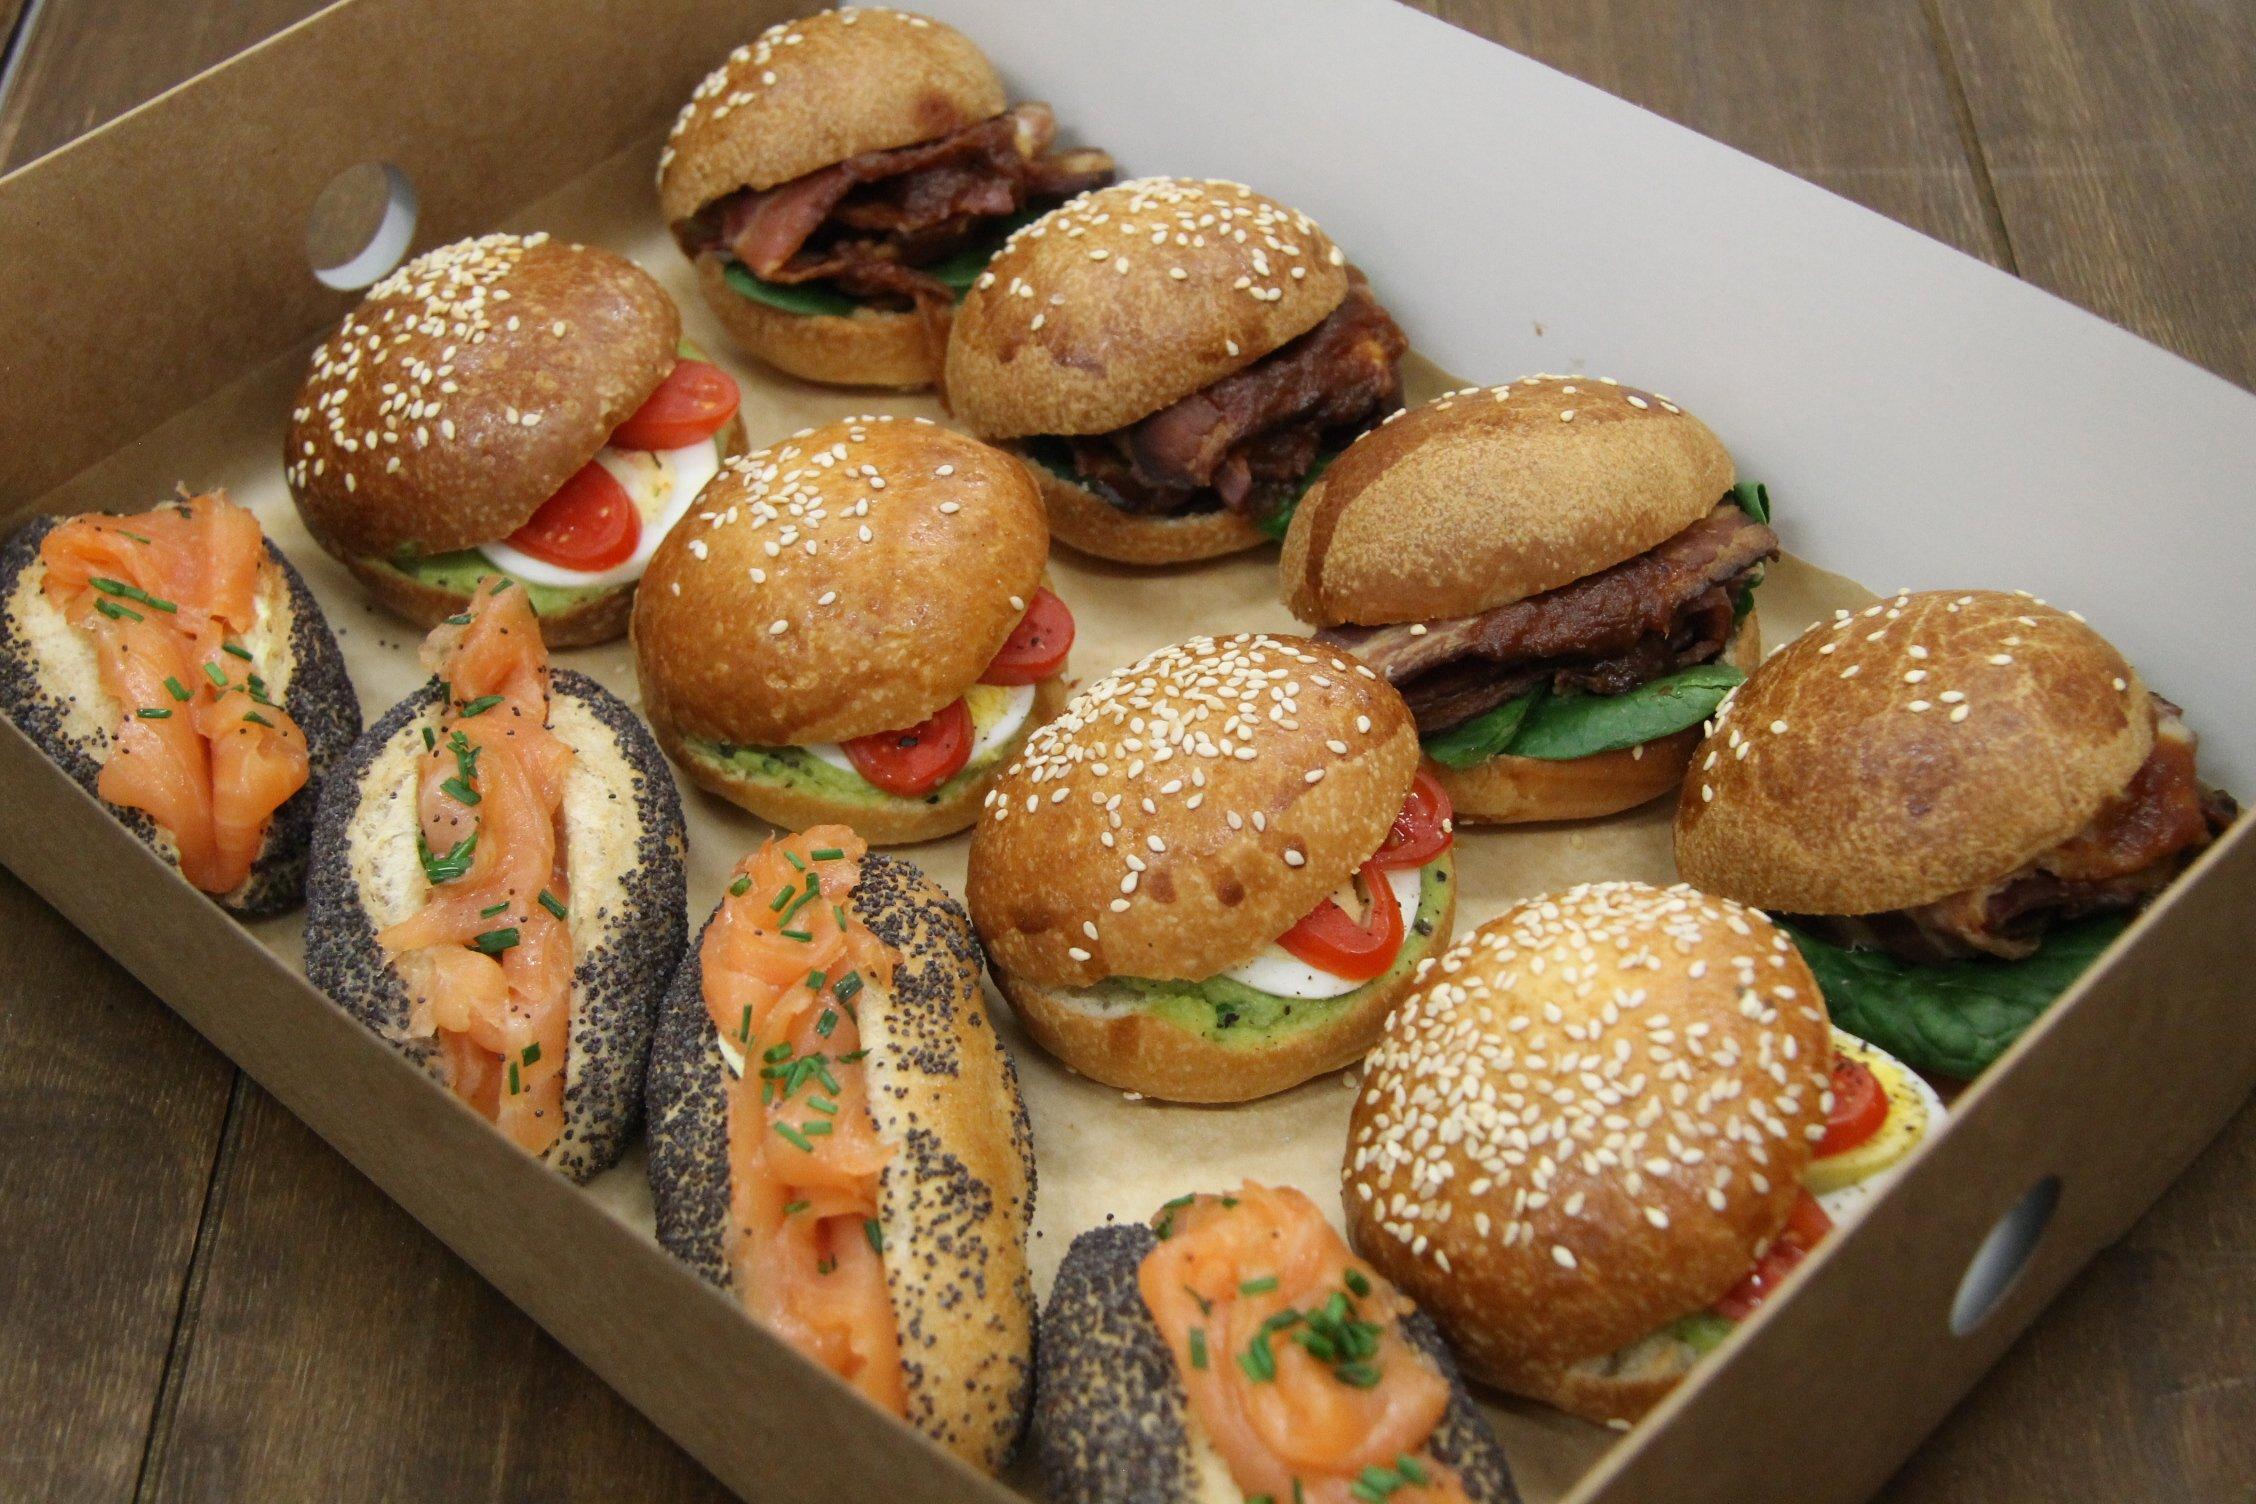 gails sandwiches